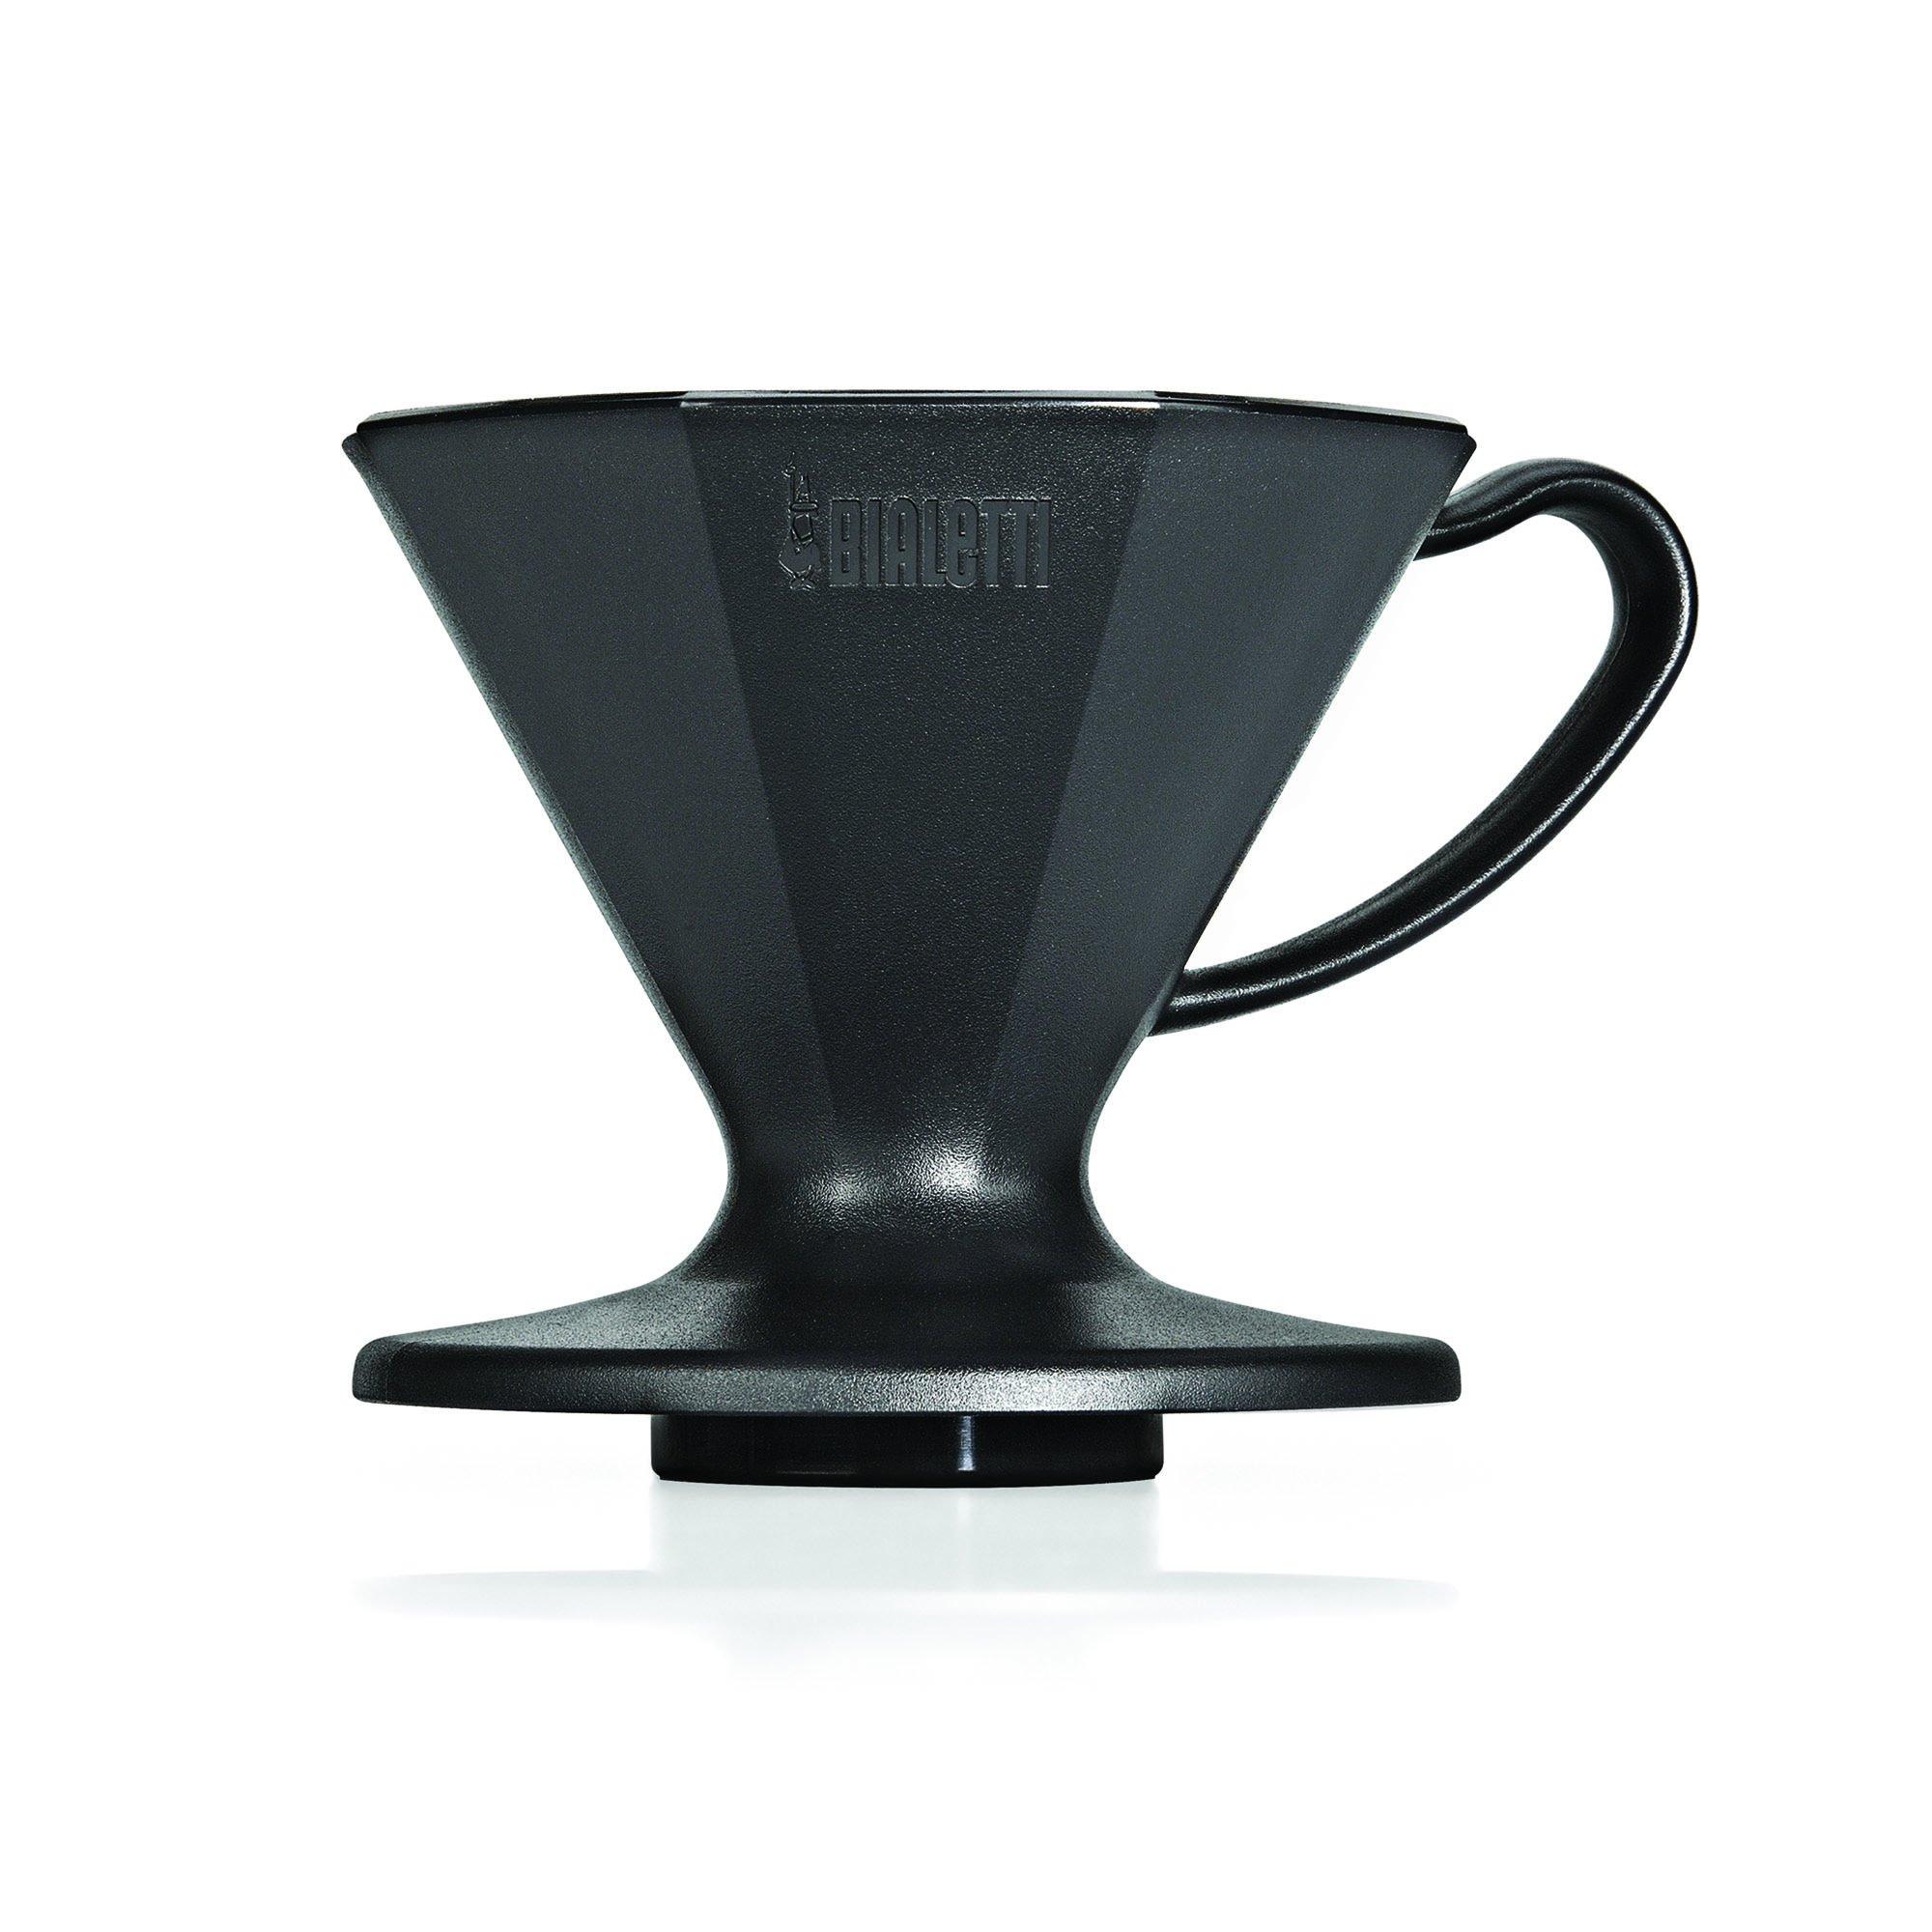 Bialetti 6751 2 Cup Plastic Pourover Coffee Dripper, Black